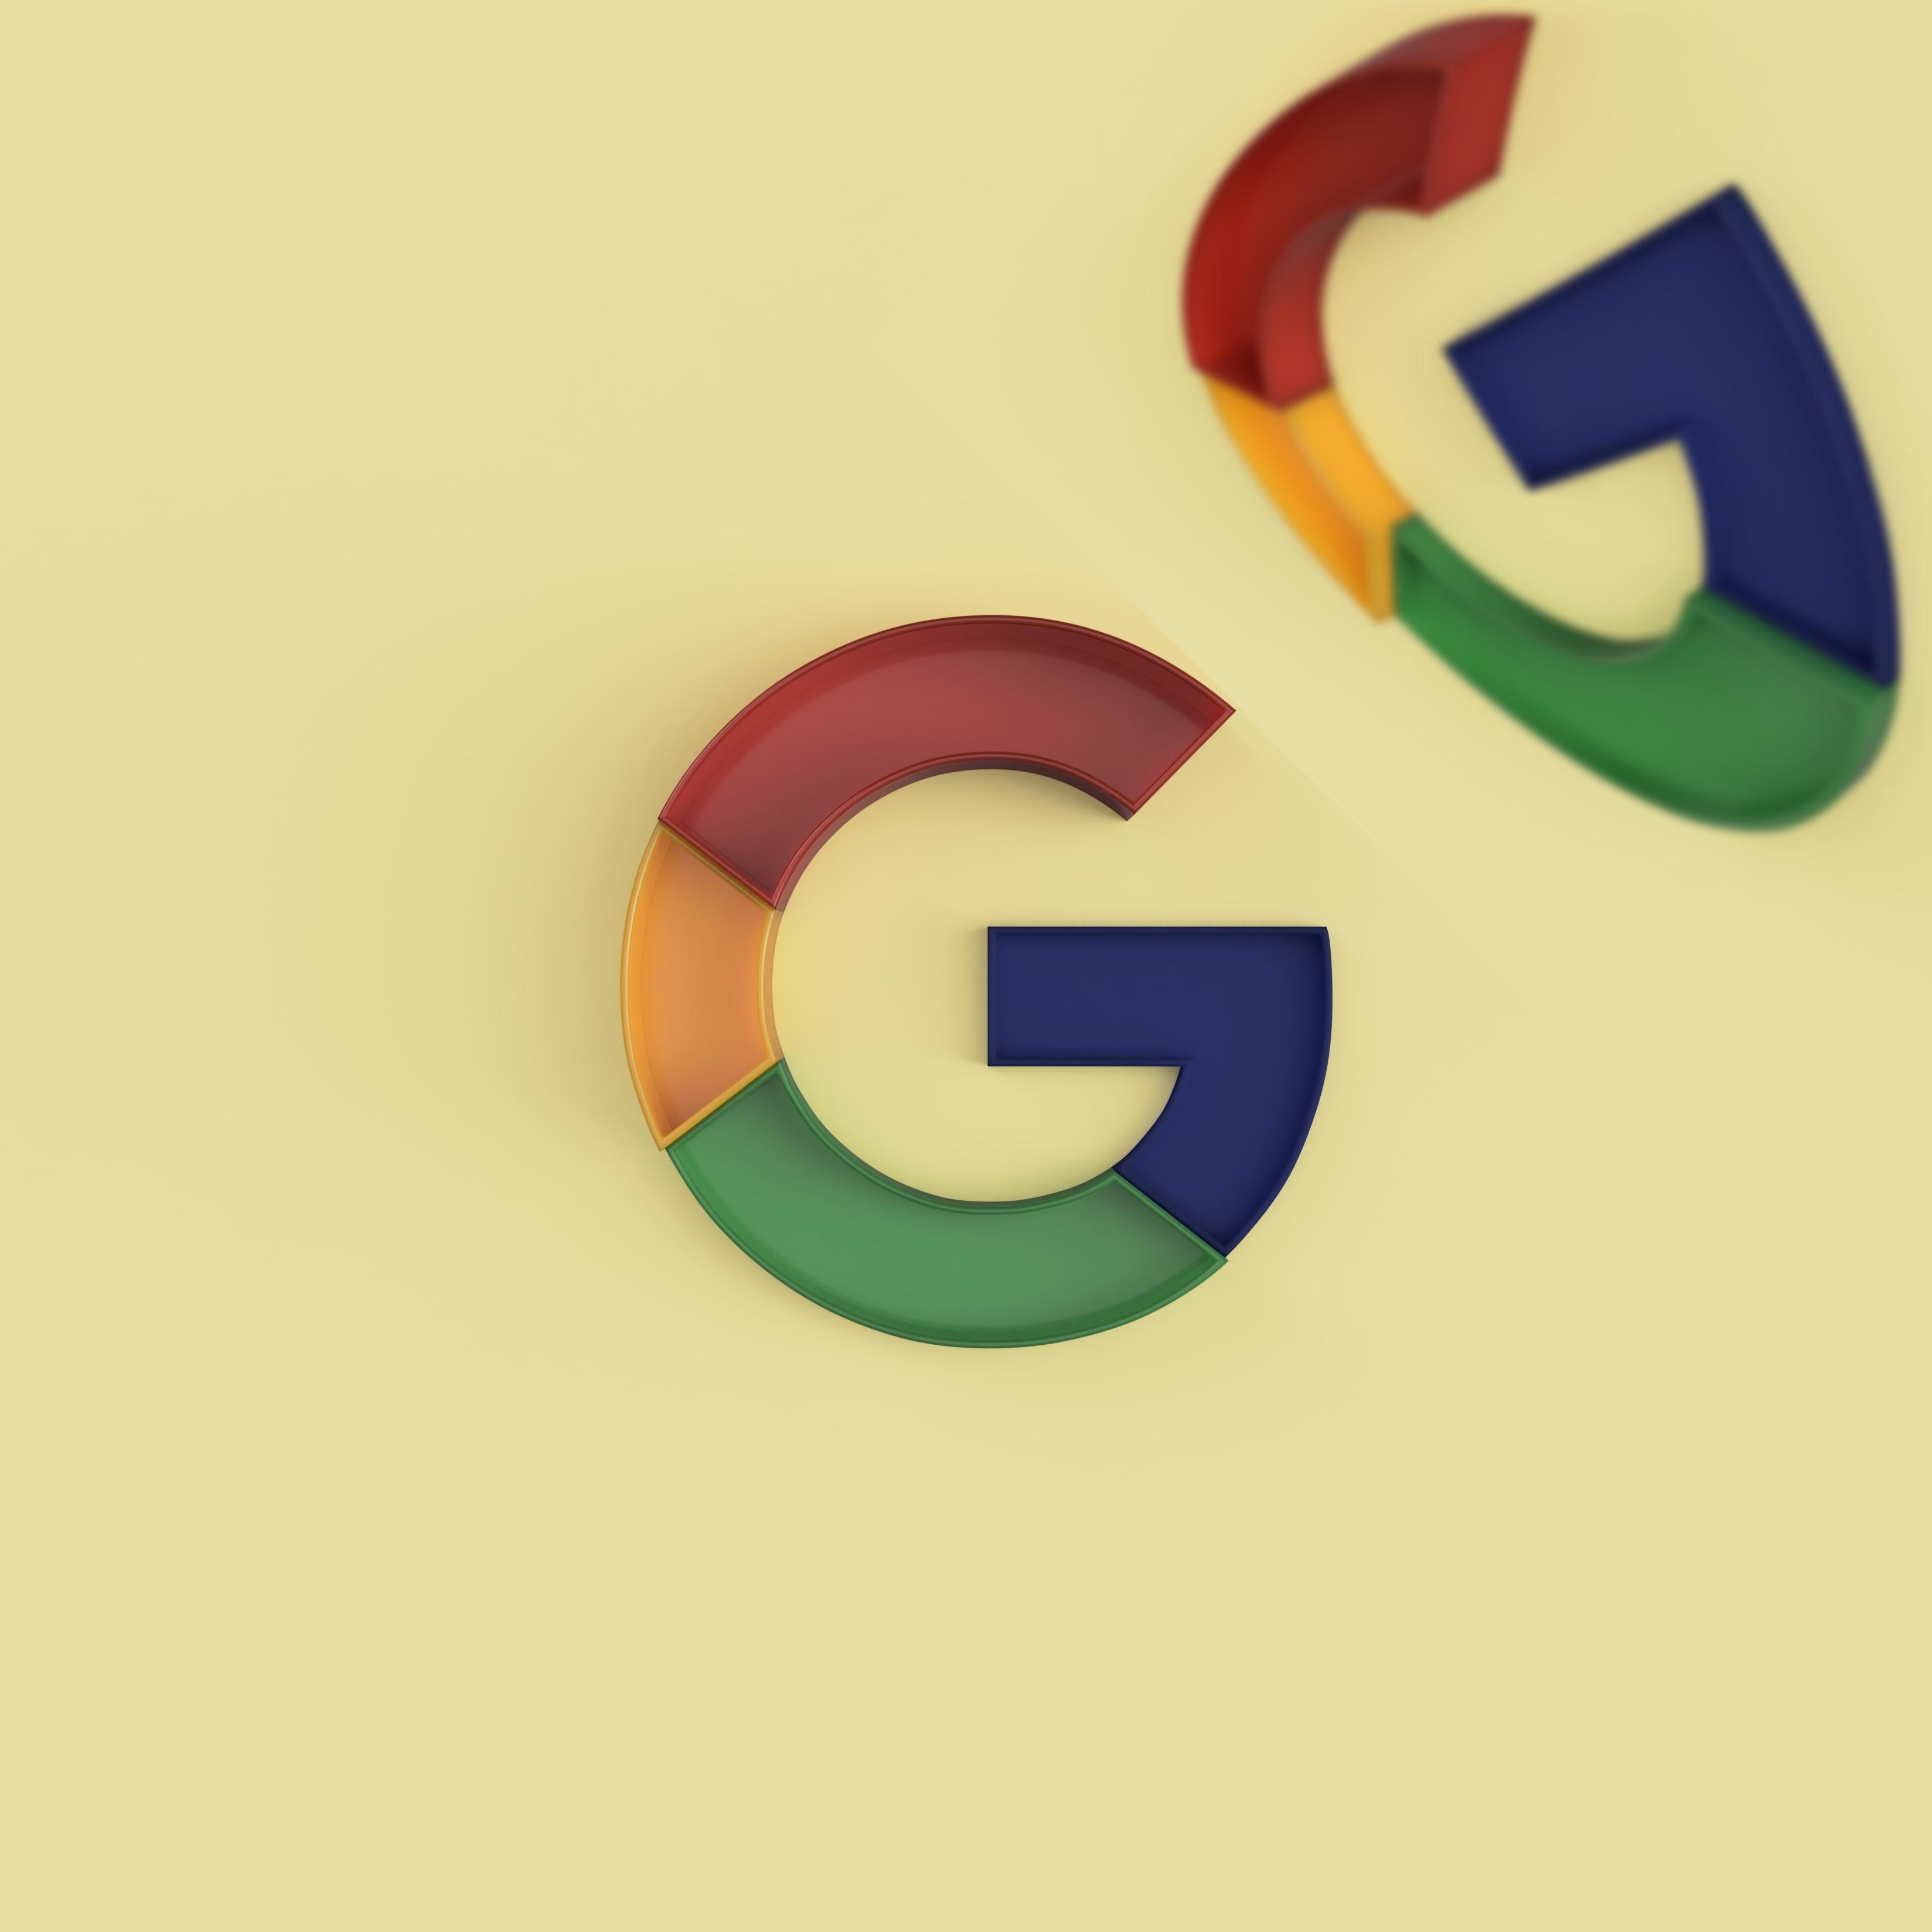 Google-3d-lcs20192fab-3500-3500